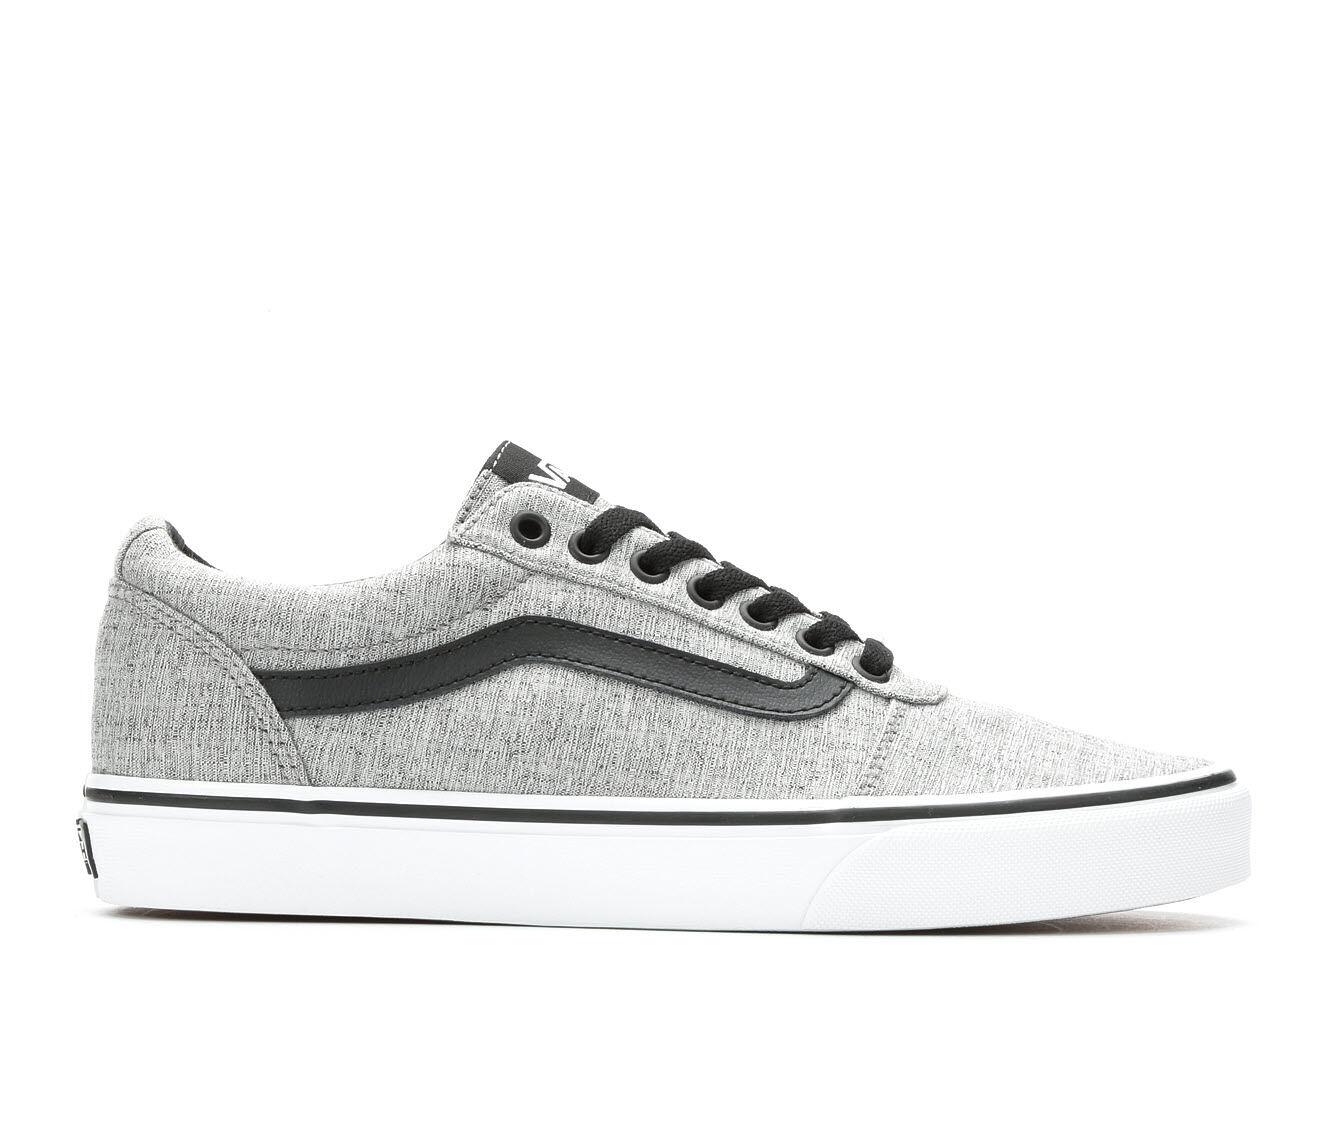 cheap 100% original browse cheap online Men's Vans Ward Textile Skate Shoes shopping online cheap official site octRpbbRvN